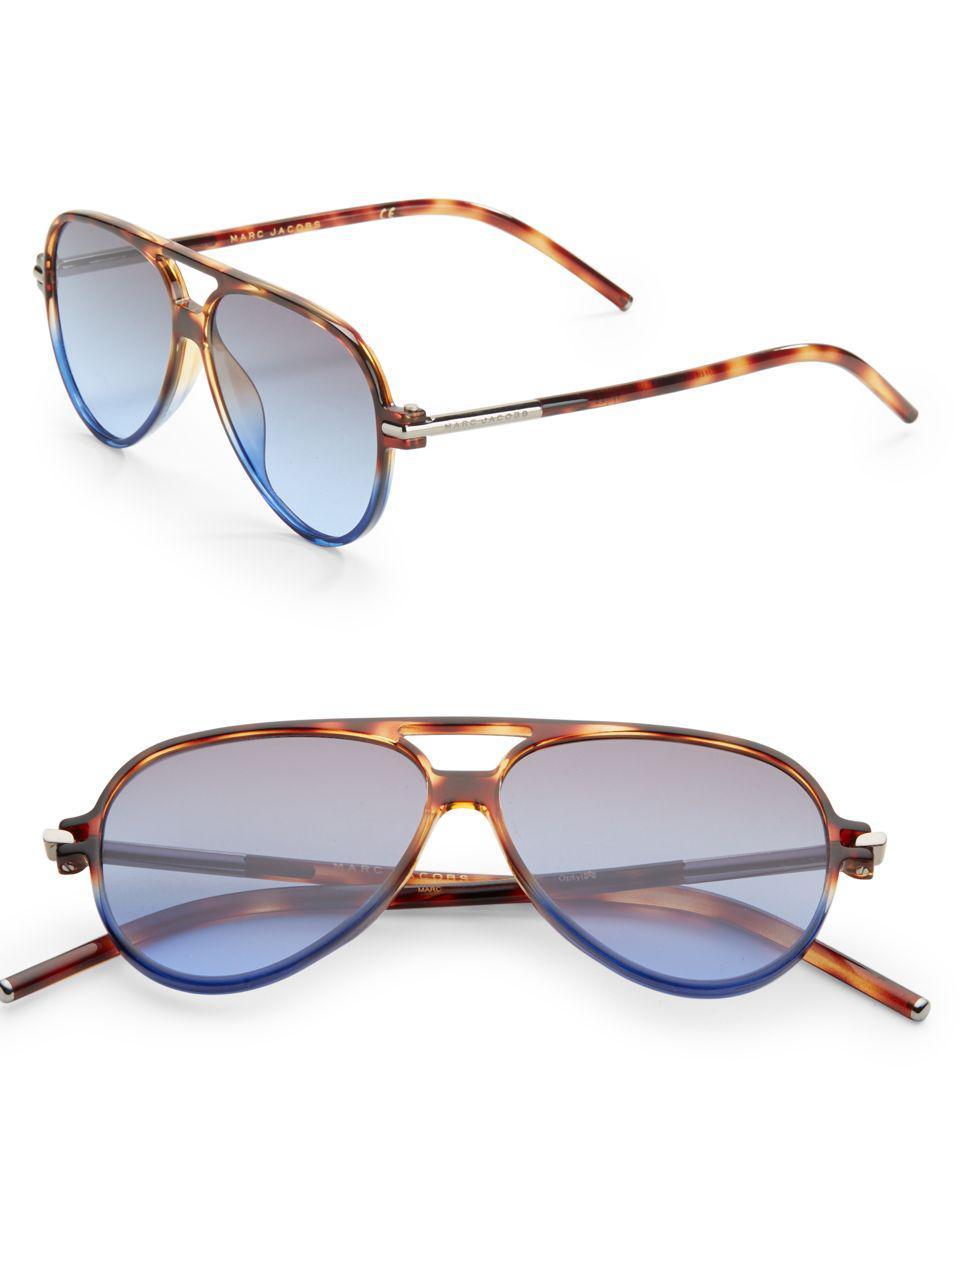 1ea2c30999ef Lyst - Marc Jacobs 56mm Aviator Sunglasses in Brown